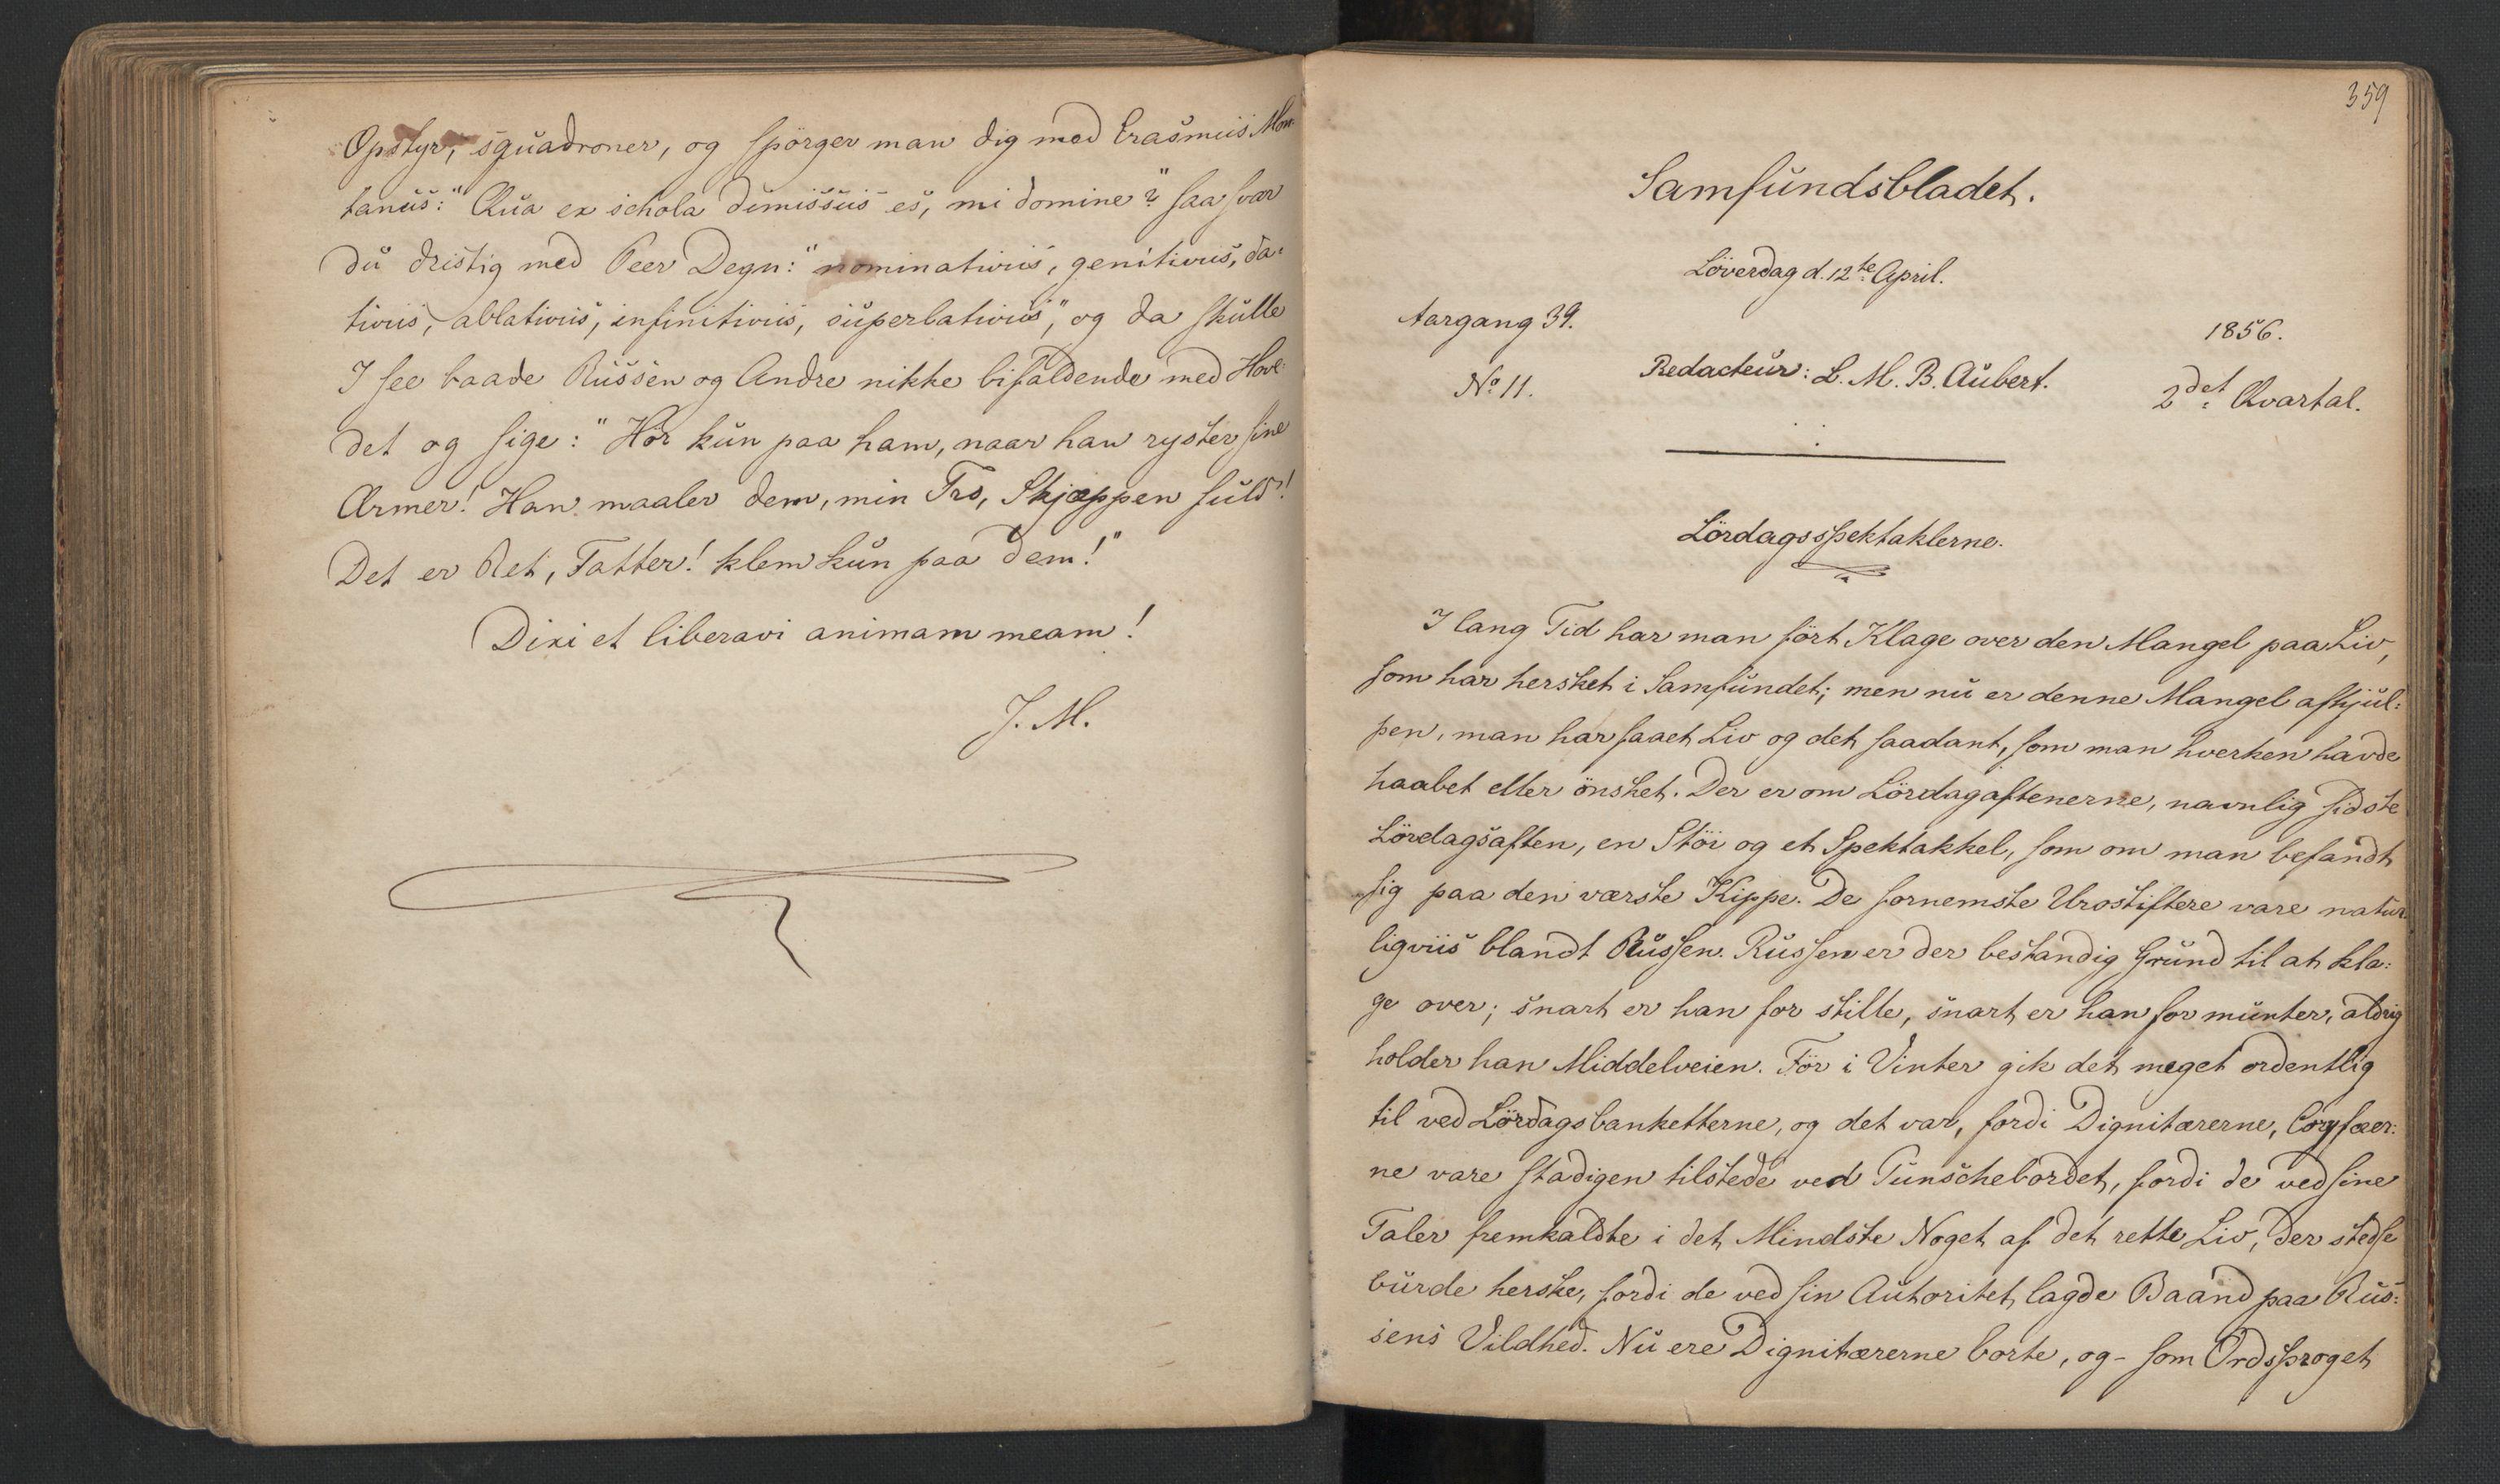 RA, Det Norske Studentersamfund, X/Xa/L0005, 1855-1856, s. 182